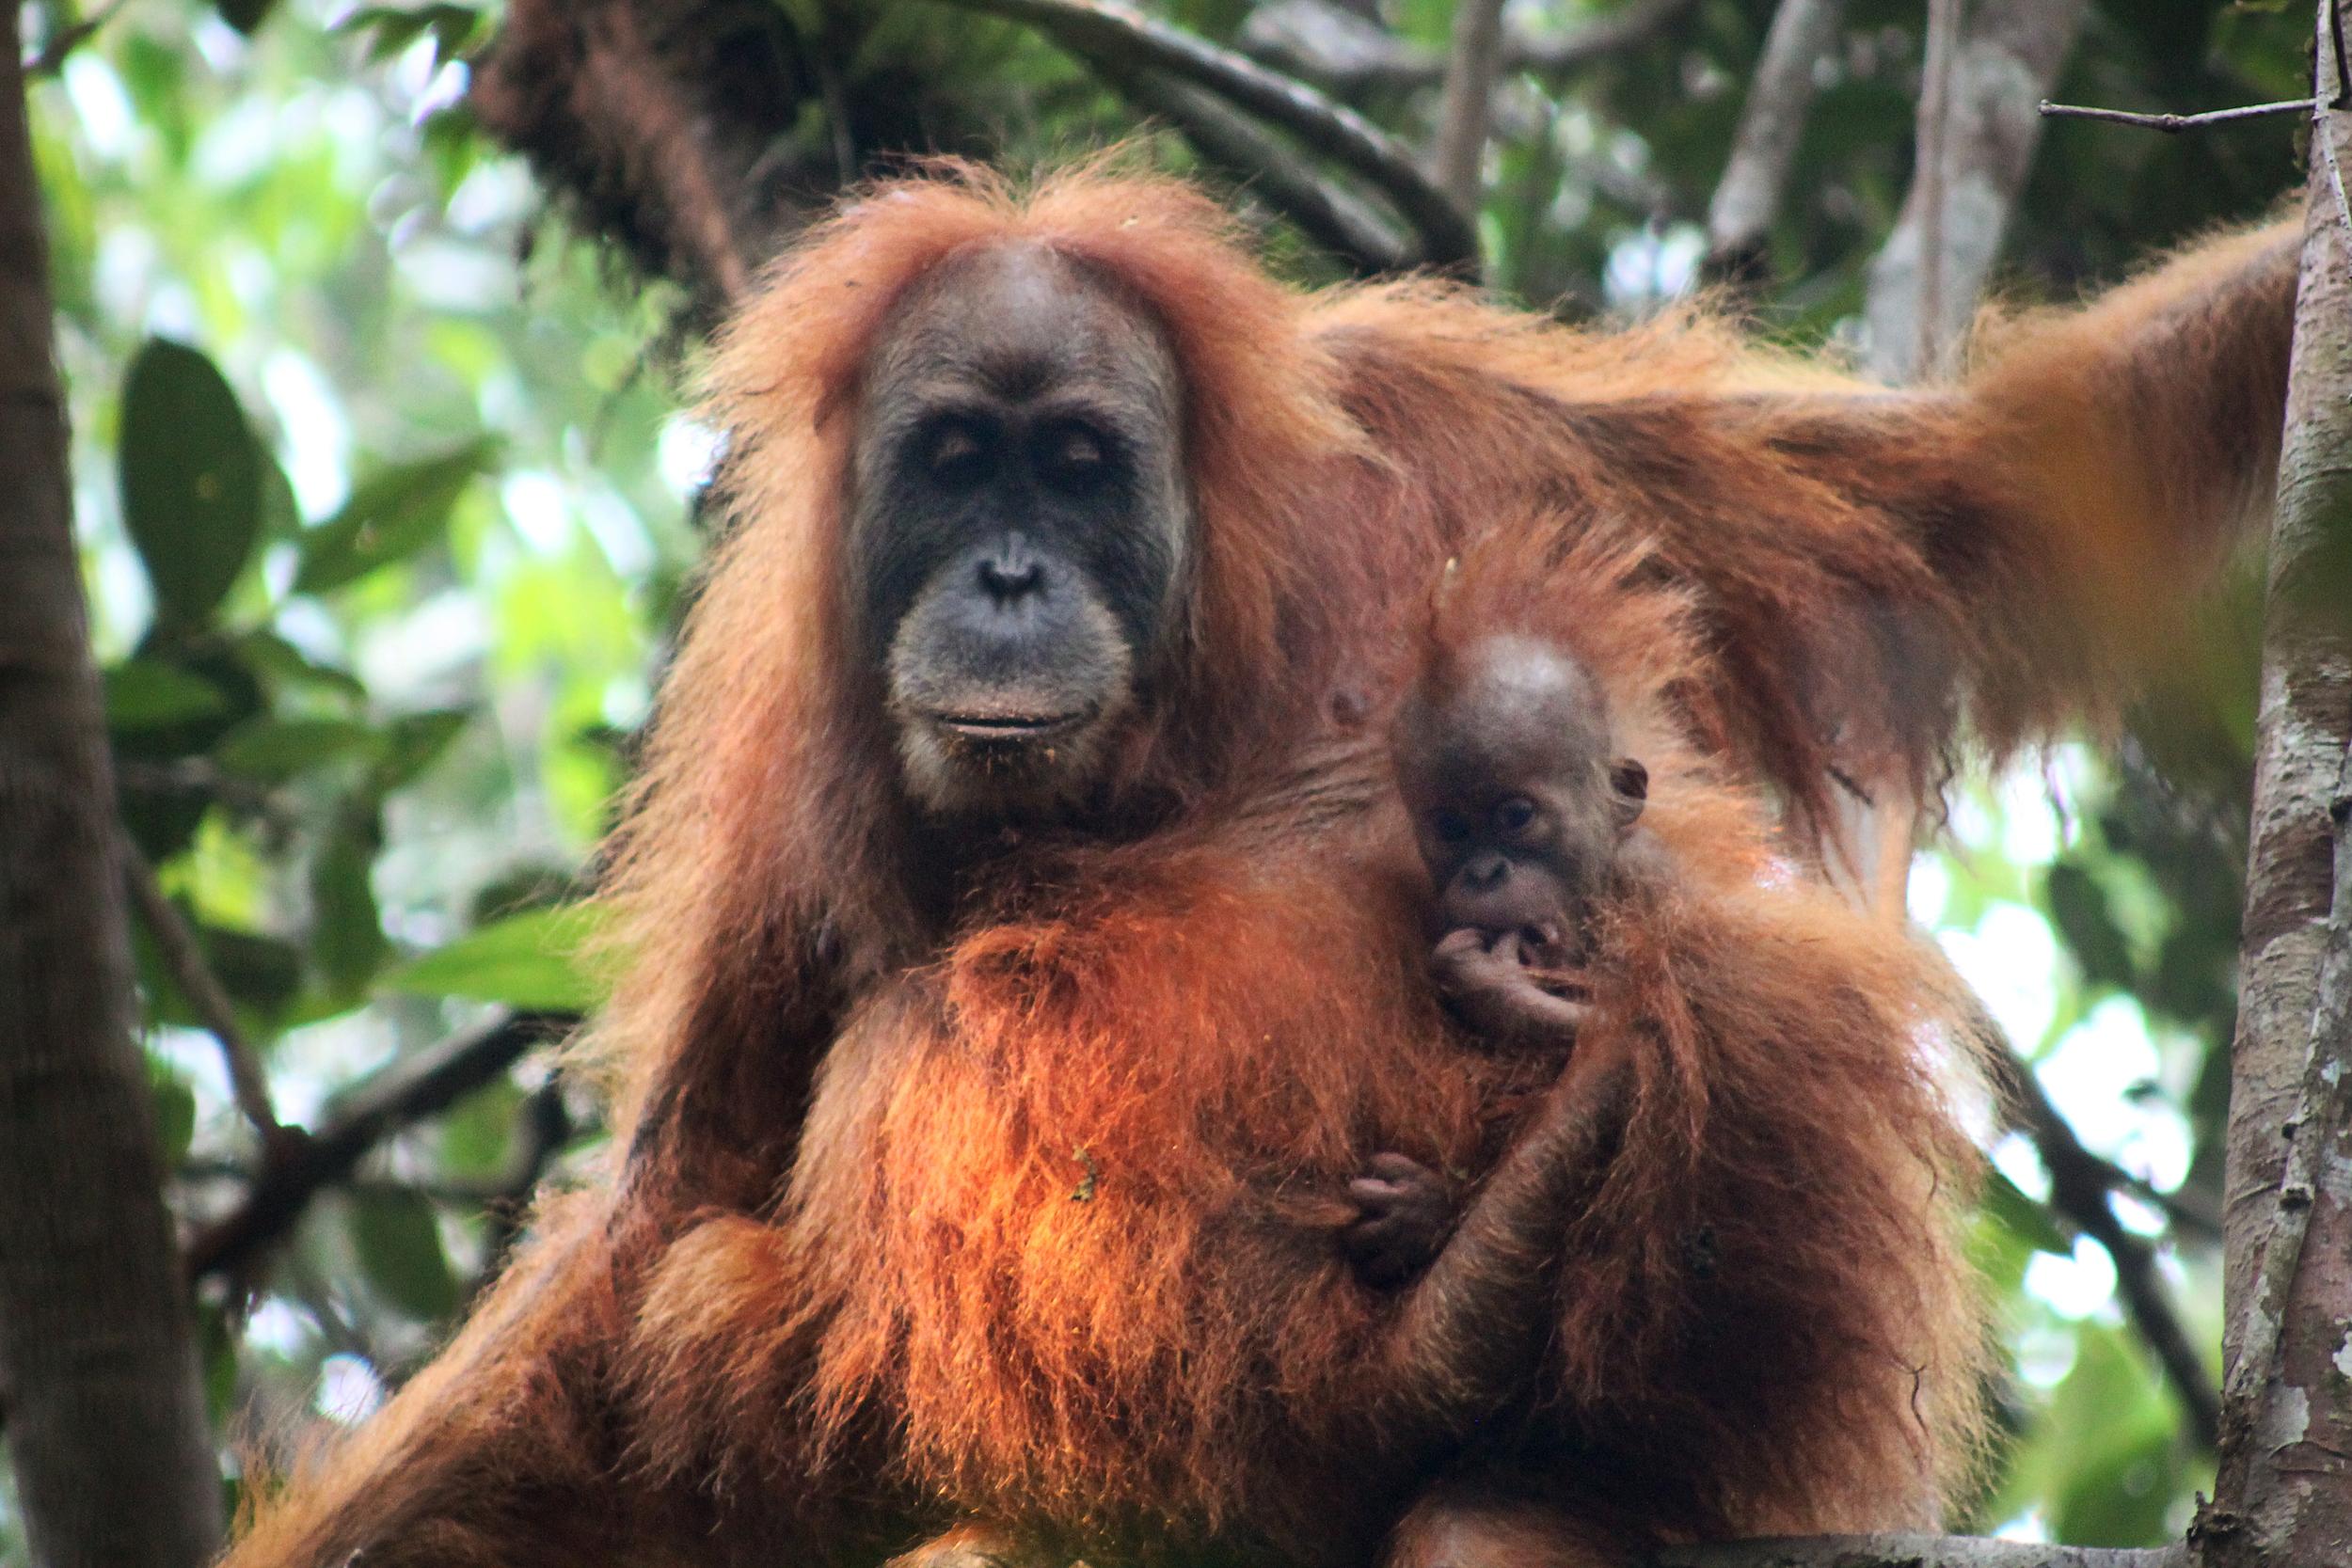 mother and child orangutan